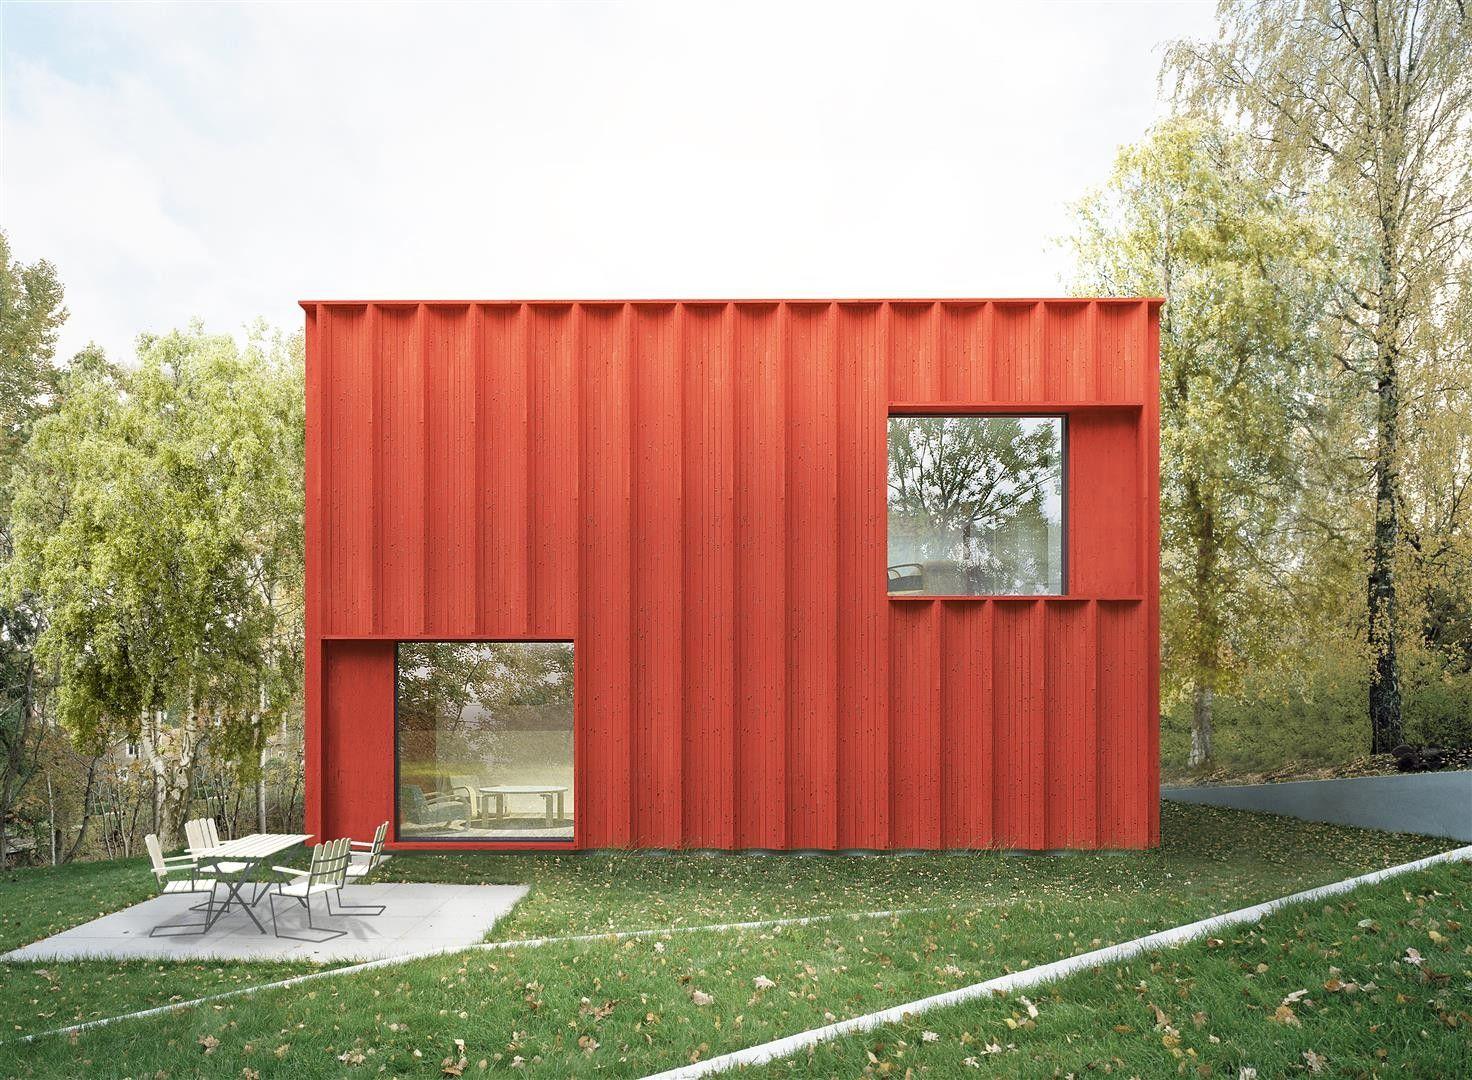 Tham Videg Rd Designs Sweden S Most Sought After Home